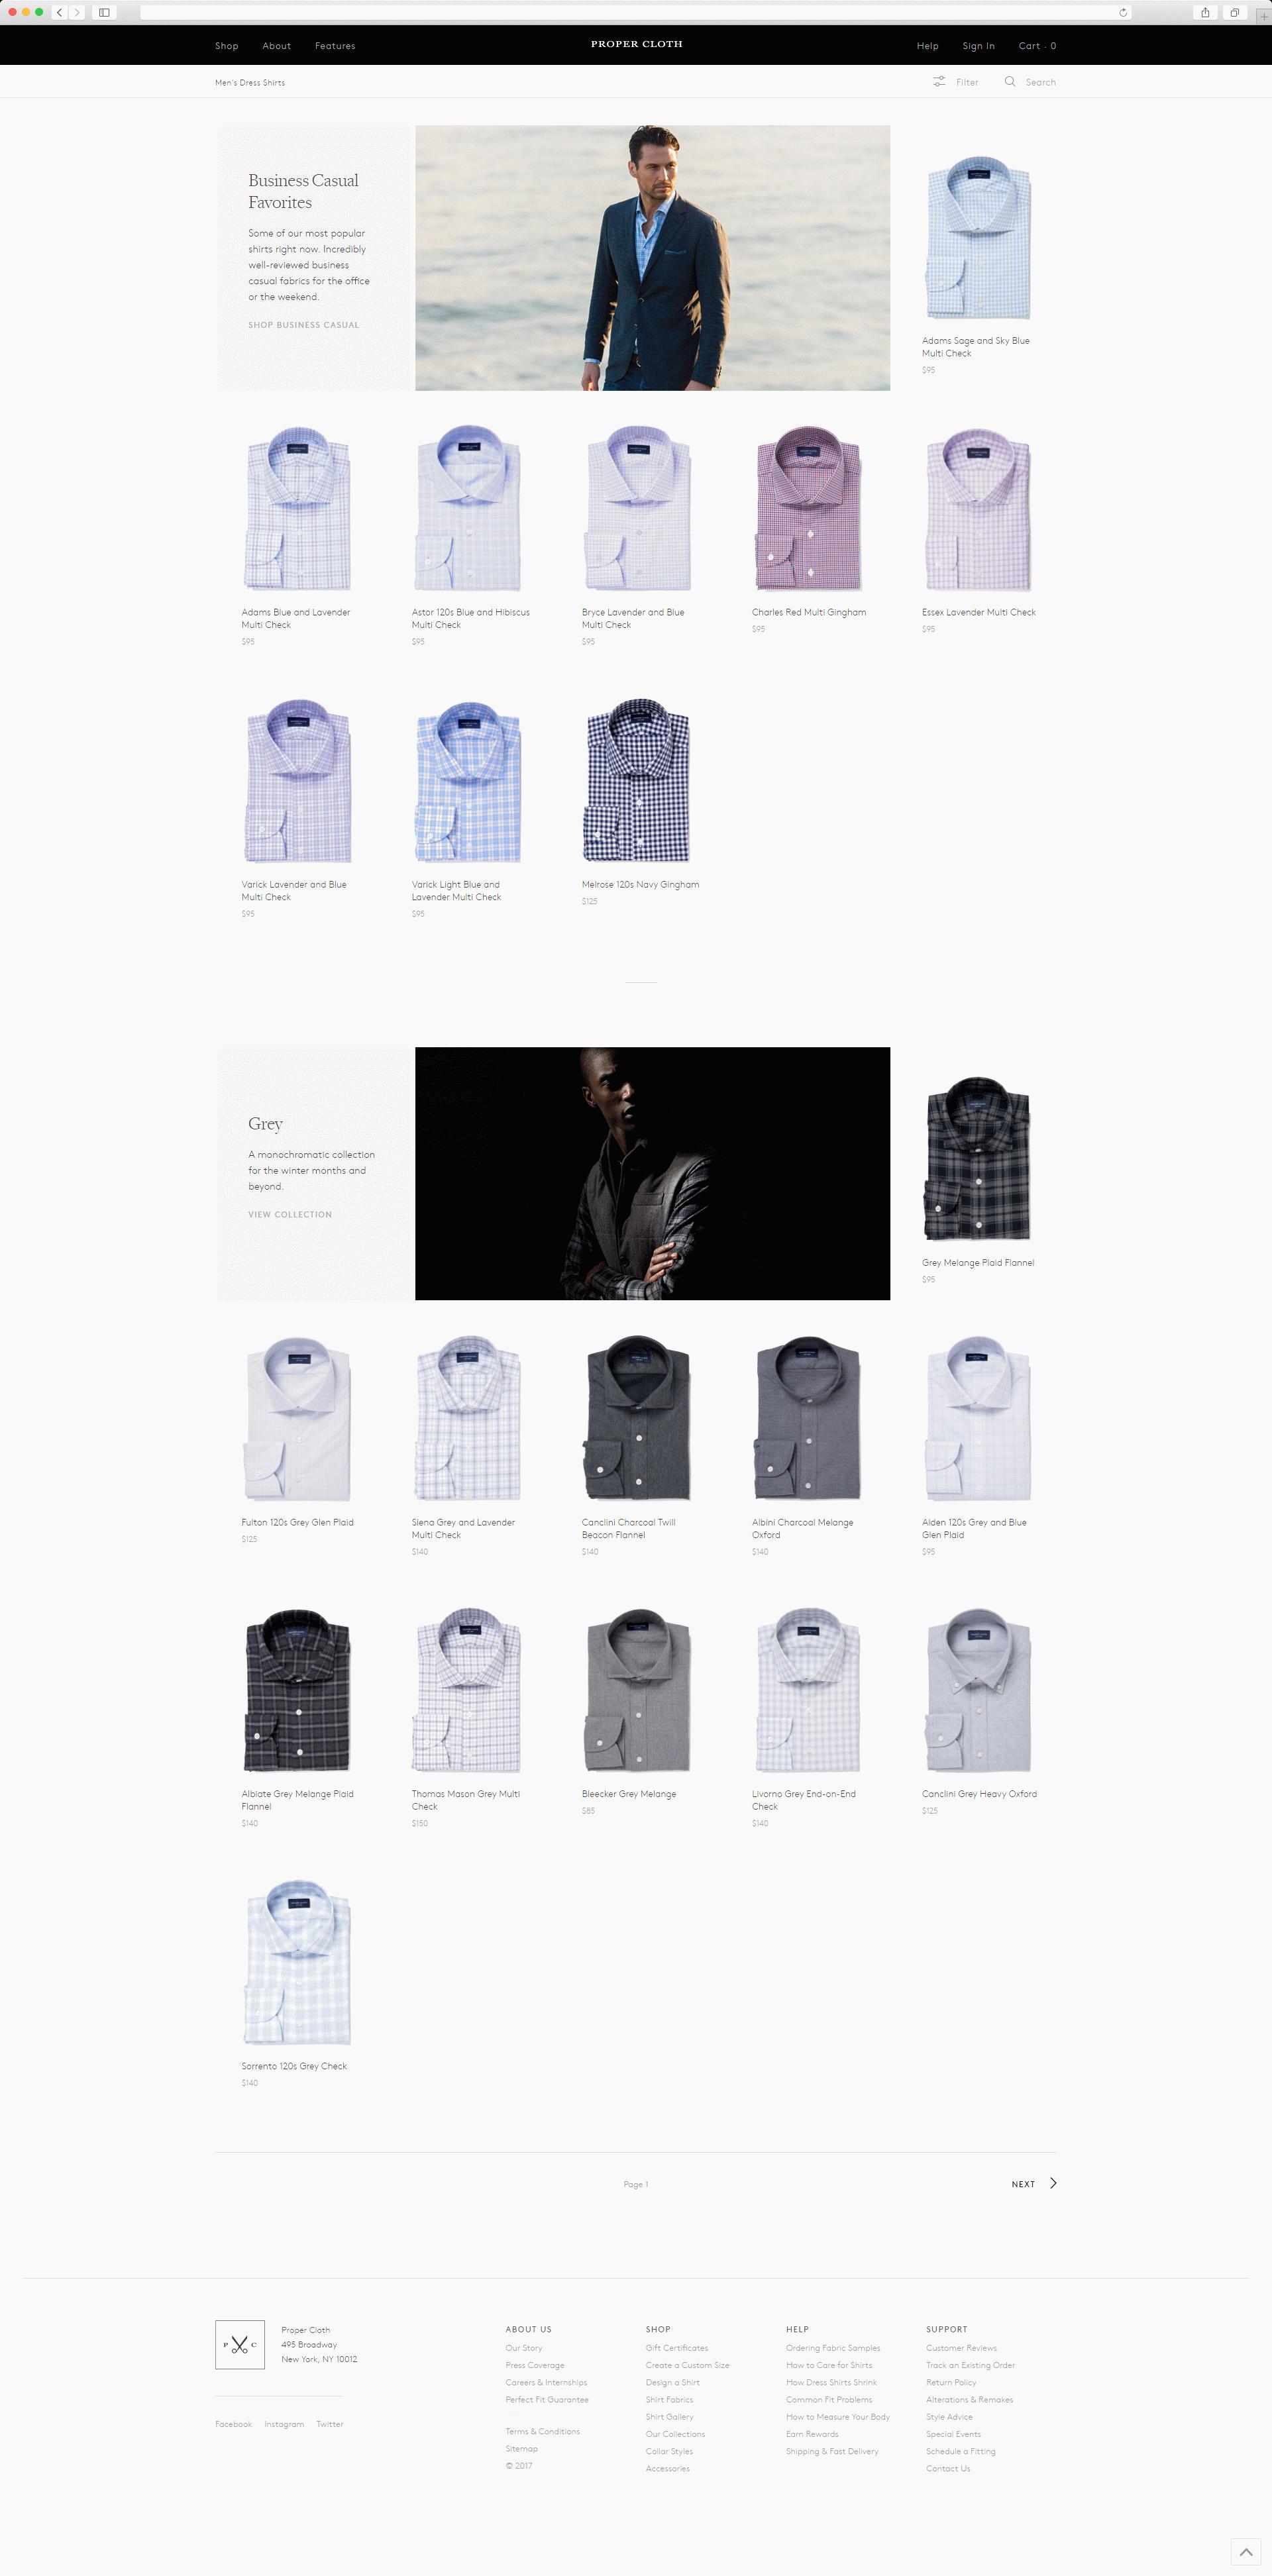 propercloth_catalog